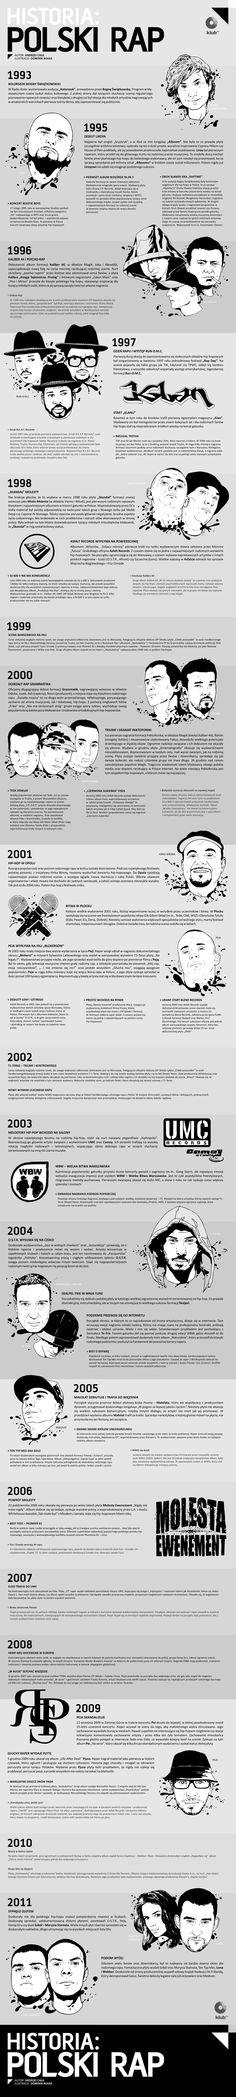 historia_polski_rap